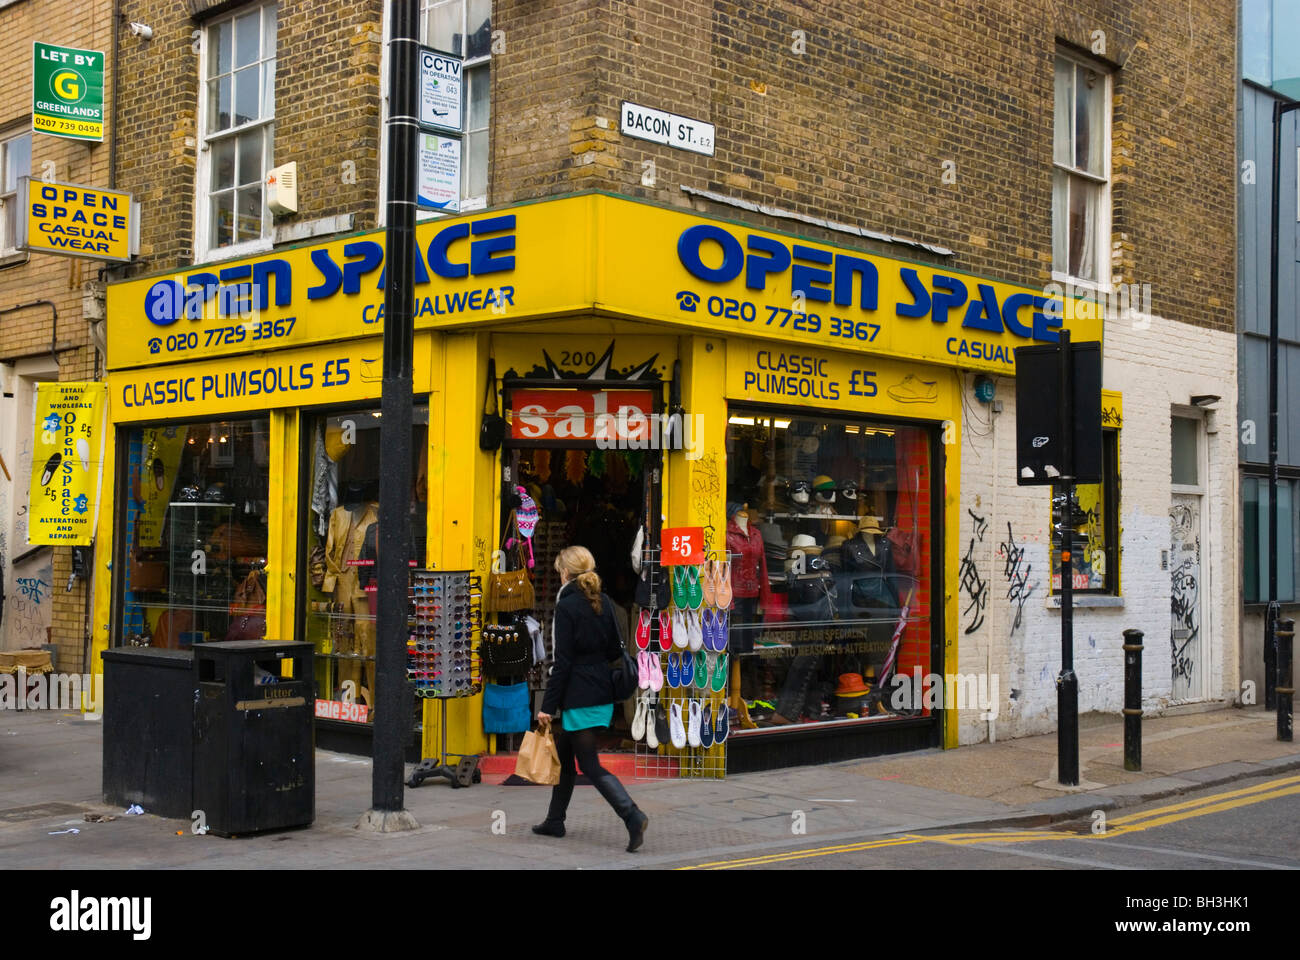 Corner of Brick Lane and Bacon Street Shoreditch East End London England UK Europe Stock Photo